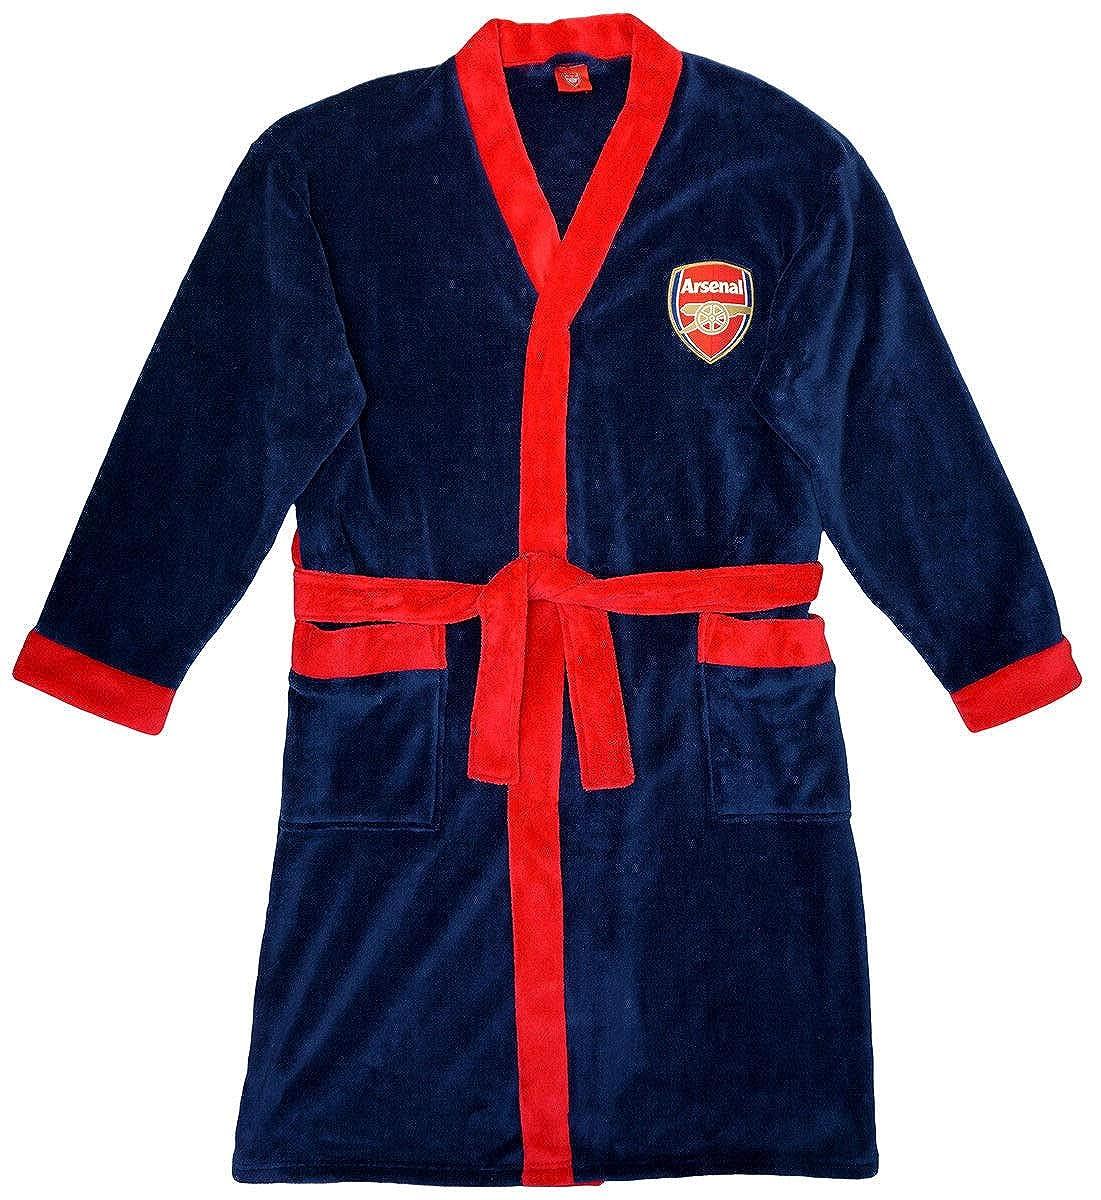 Arsenal FC Men's Dressing Gown